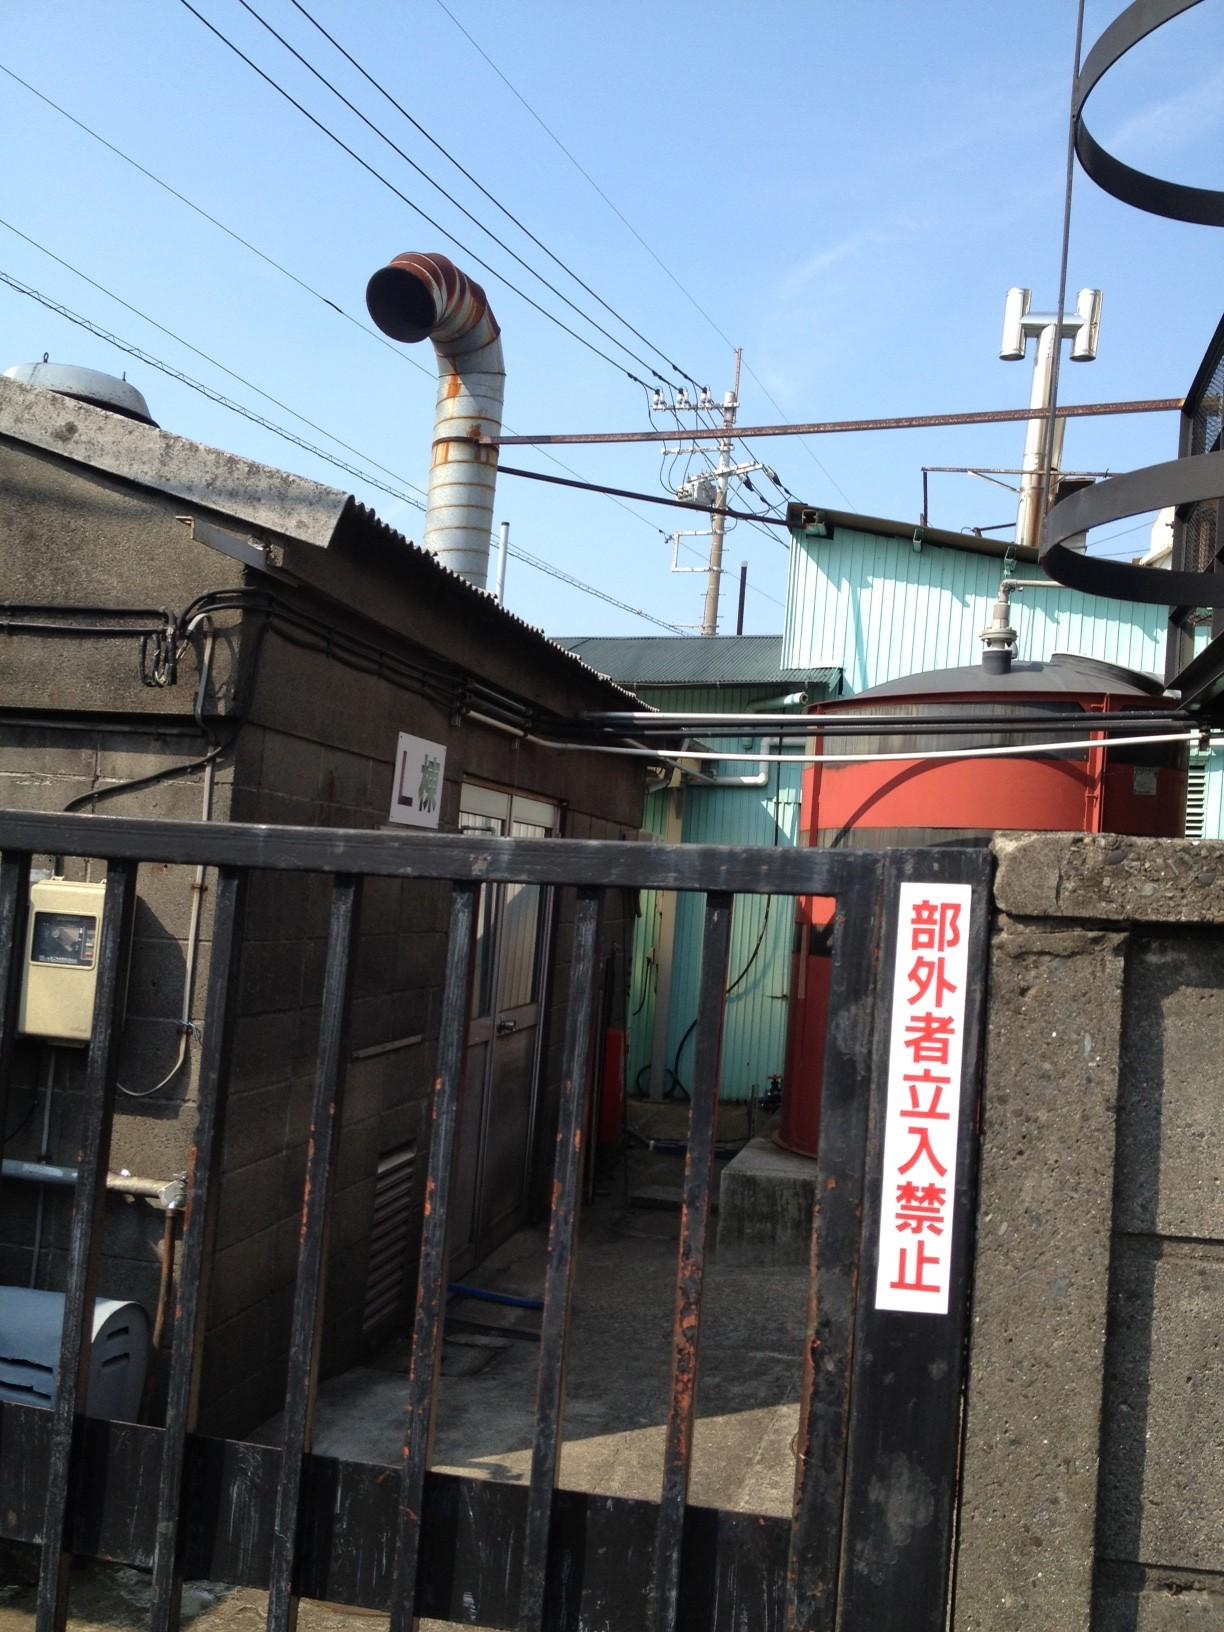 L棟 煙突 赤いタンク 立入禁止 電線 鉄格子 朝の空_a0163788_222156.jpg